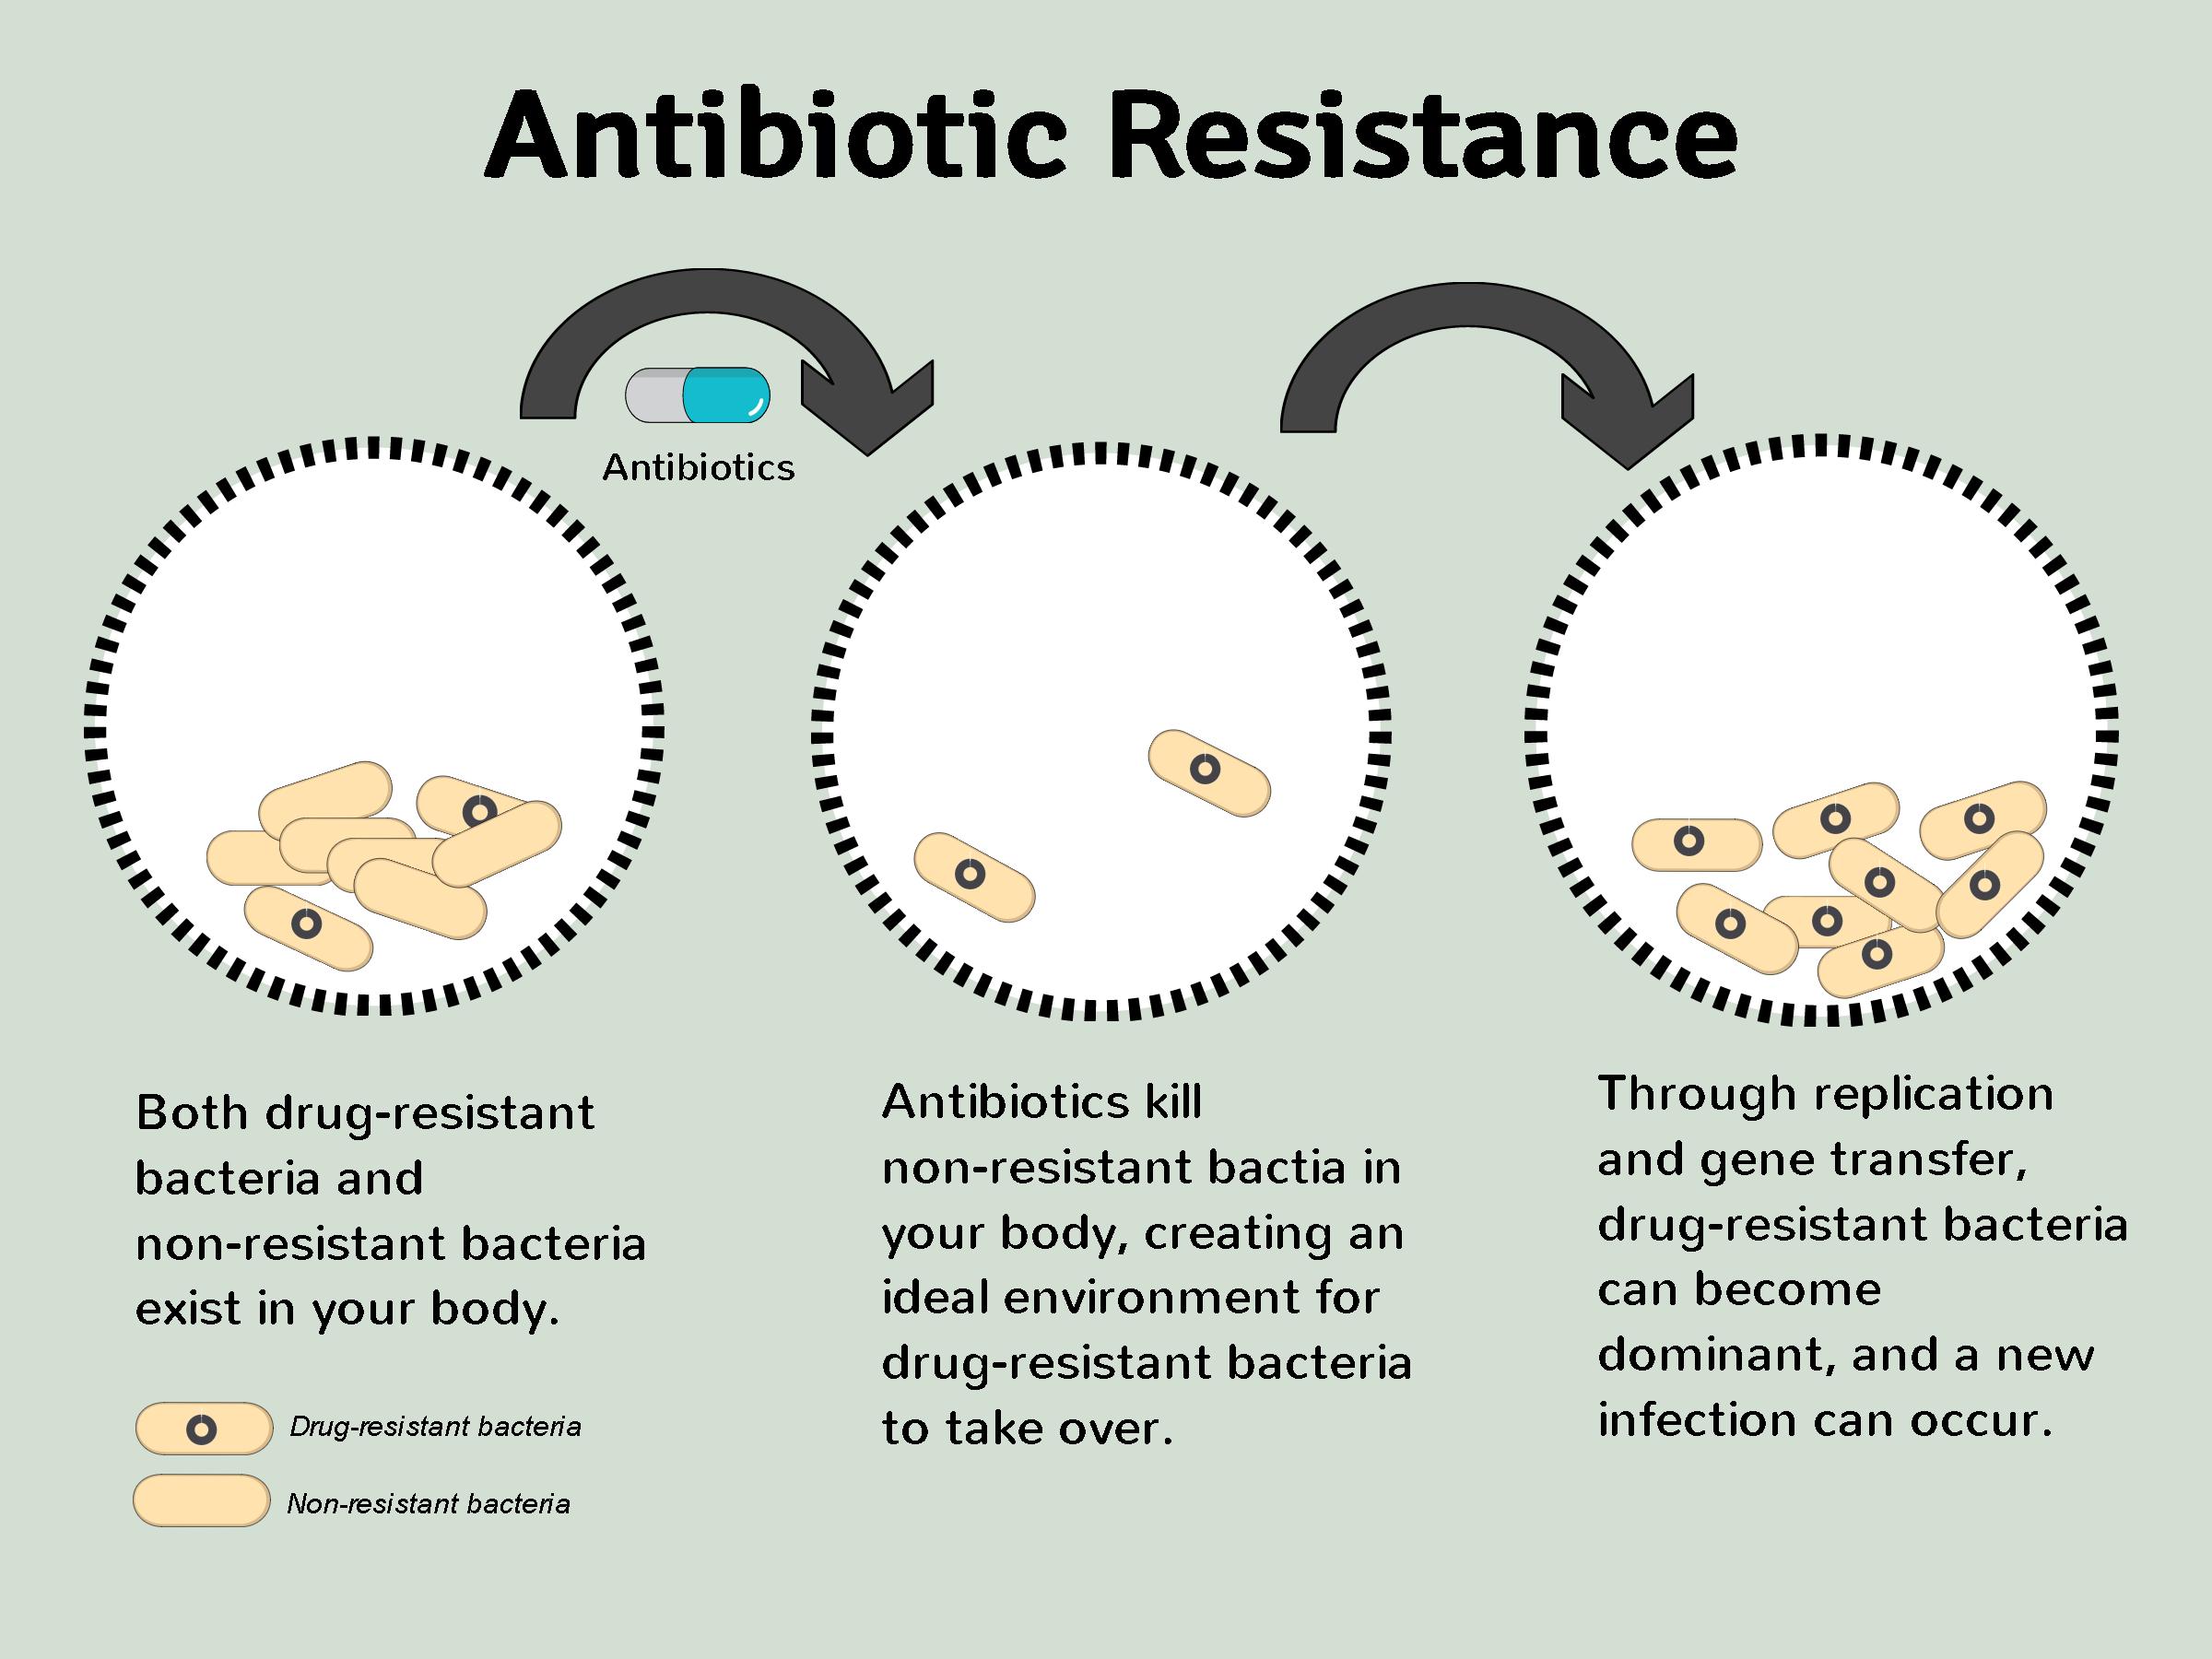 how antibiotics resistance occurs